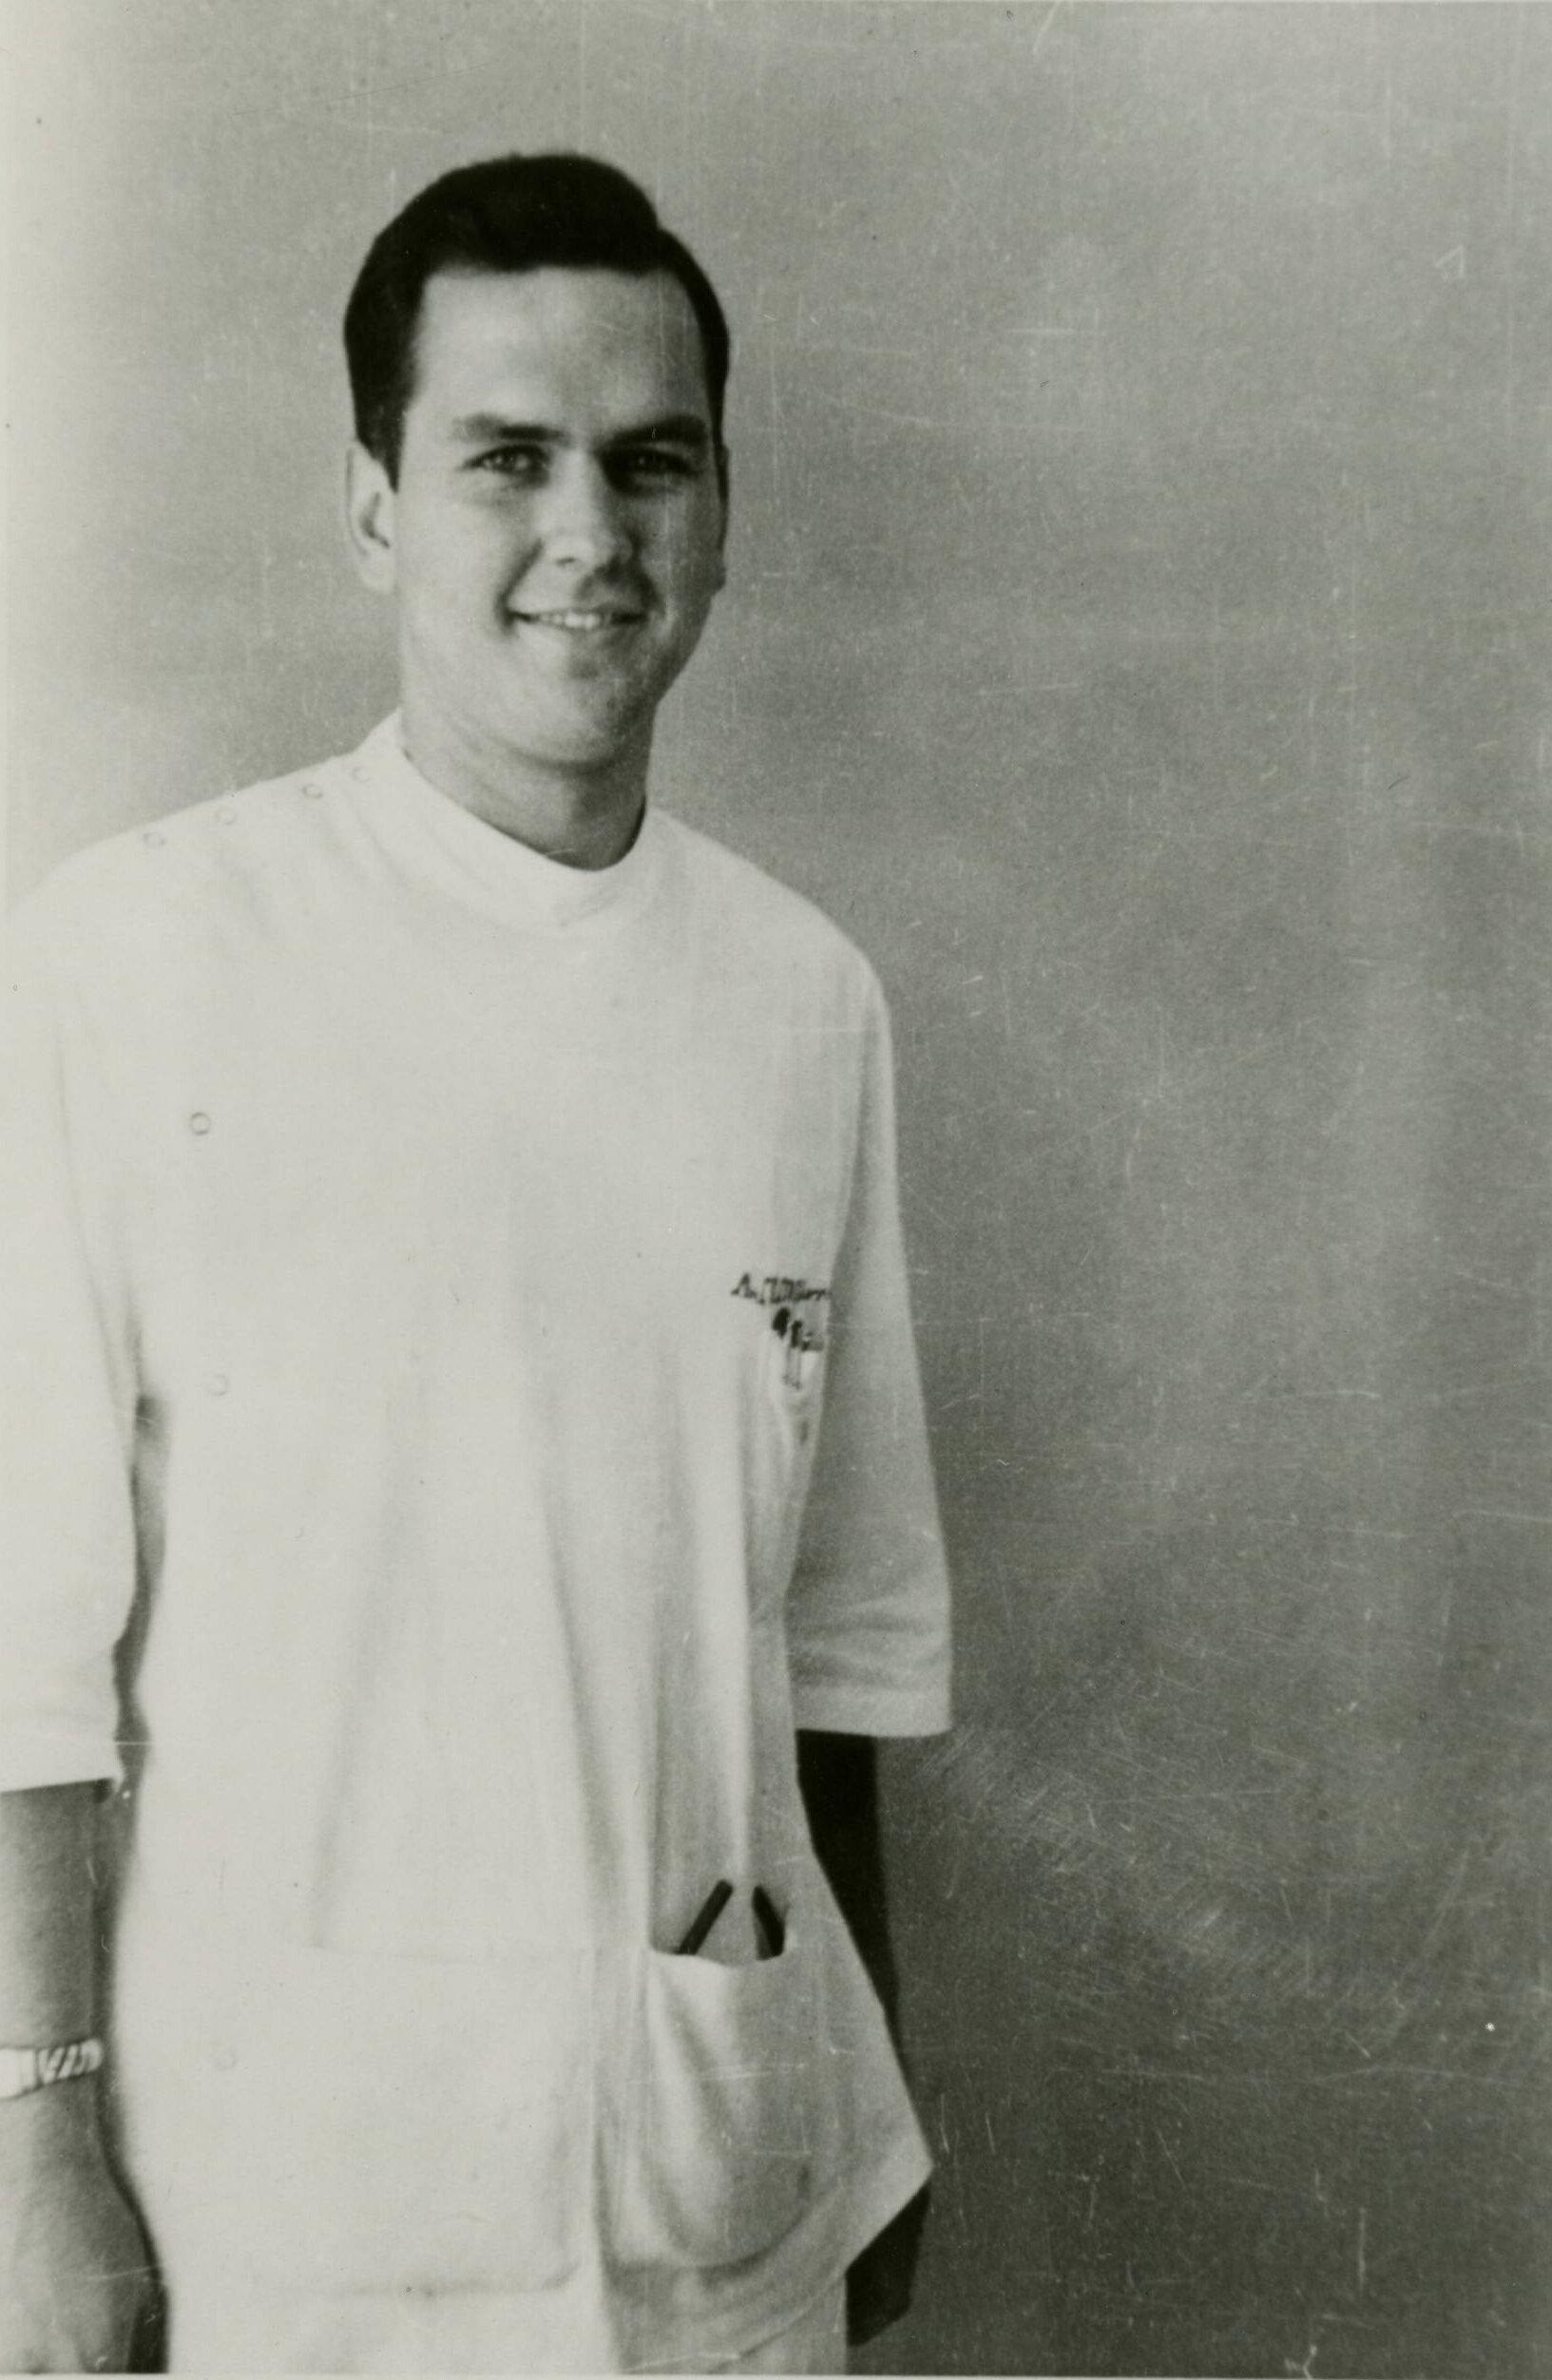 Nelson studying at the University of Minnesota. Image courtesy University of Minnesota Archives.